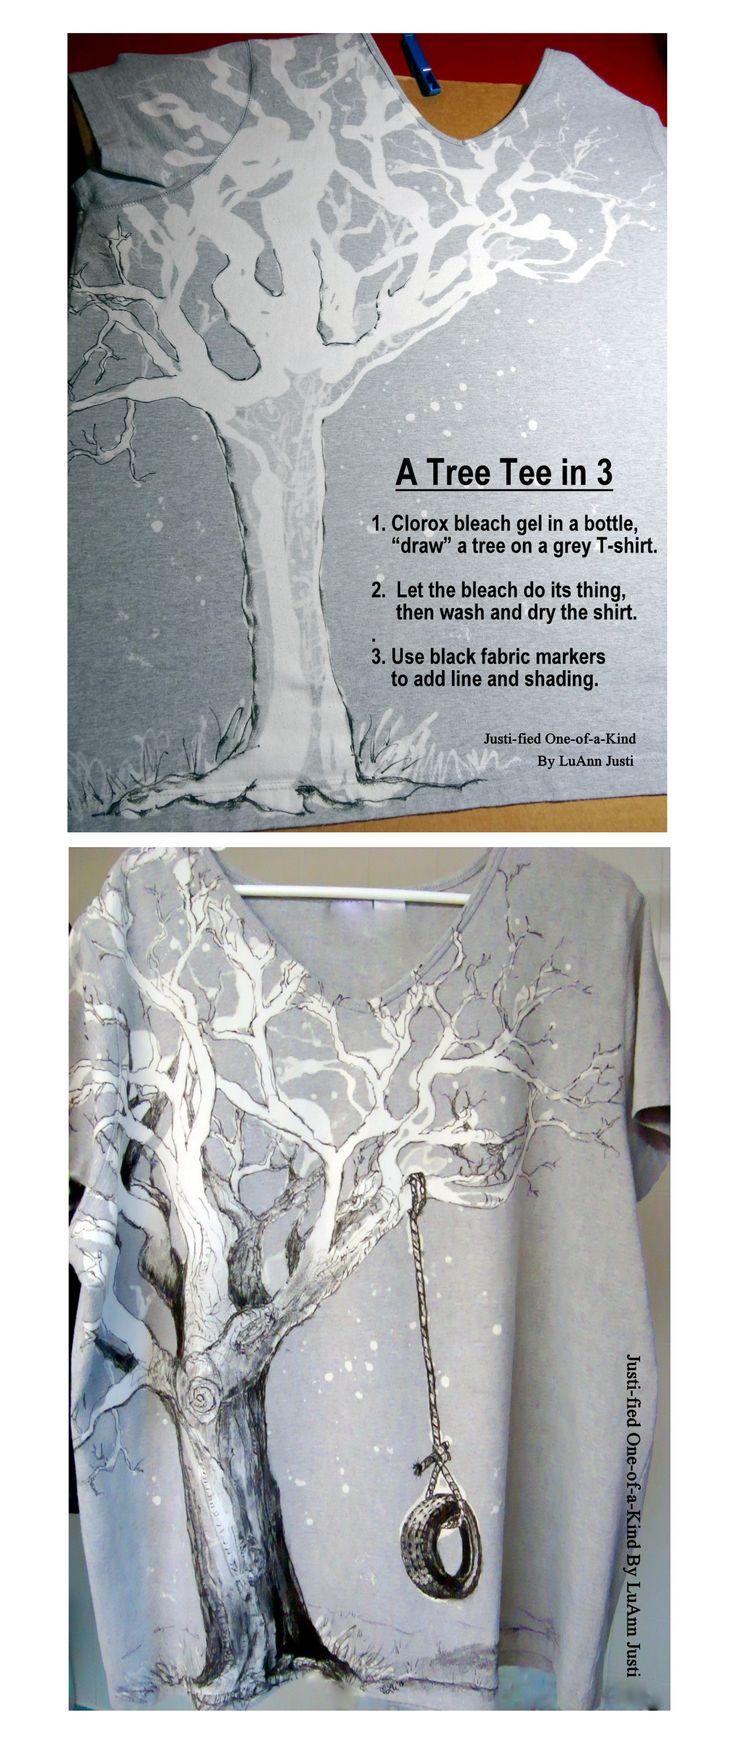 Drawn shirt fabric marker 25+ pen) markers (not gel